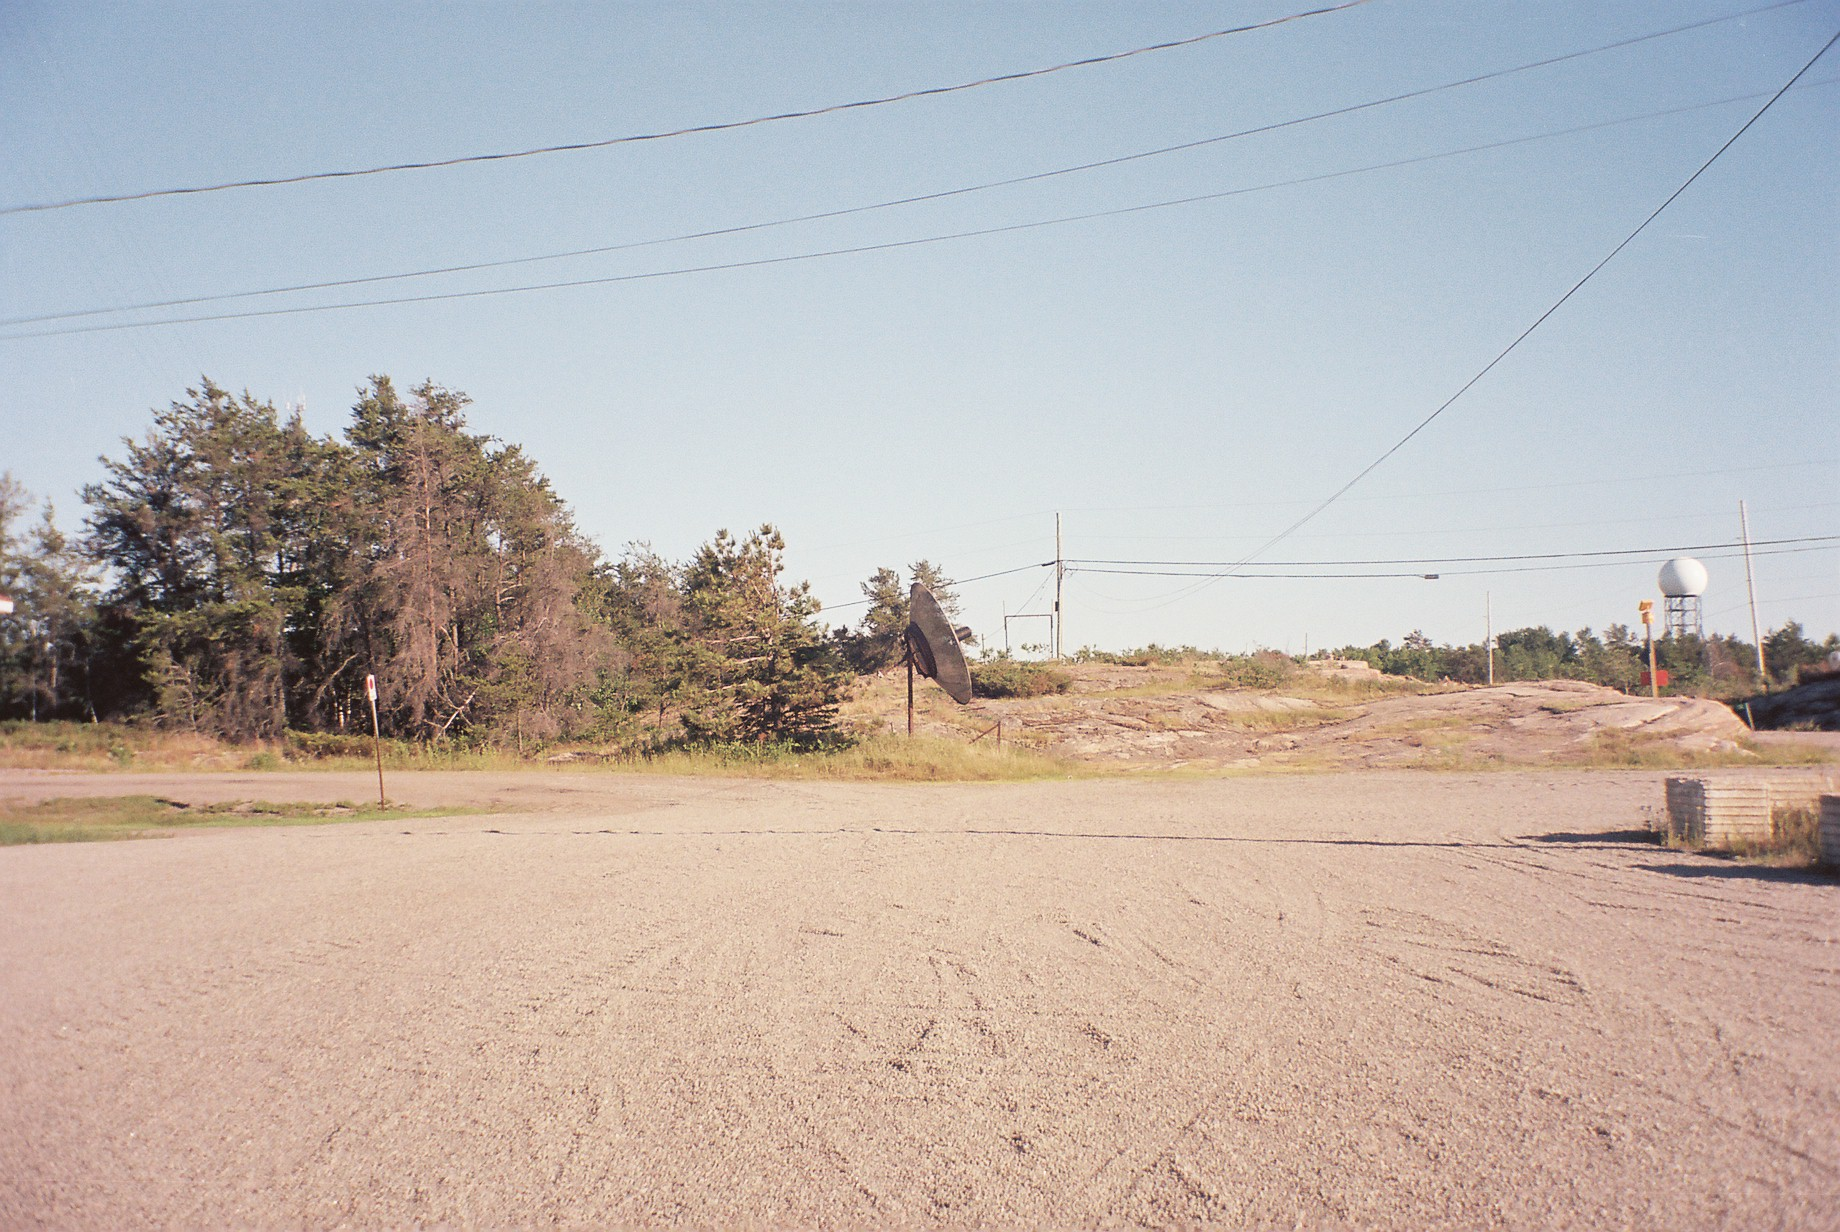 untitled shoot-3710021.JPG